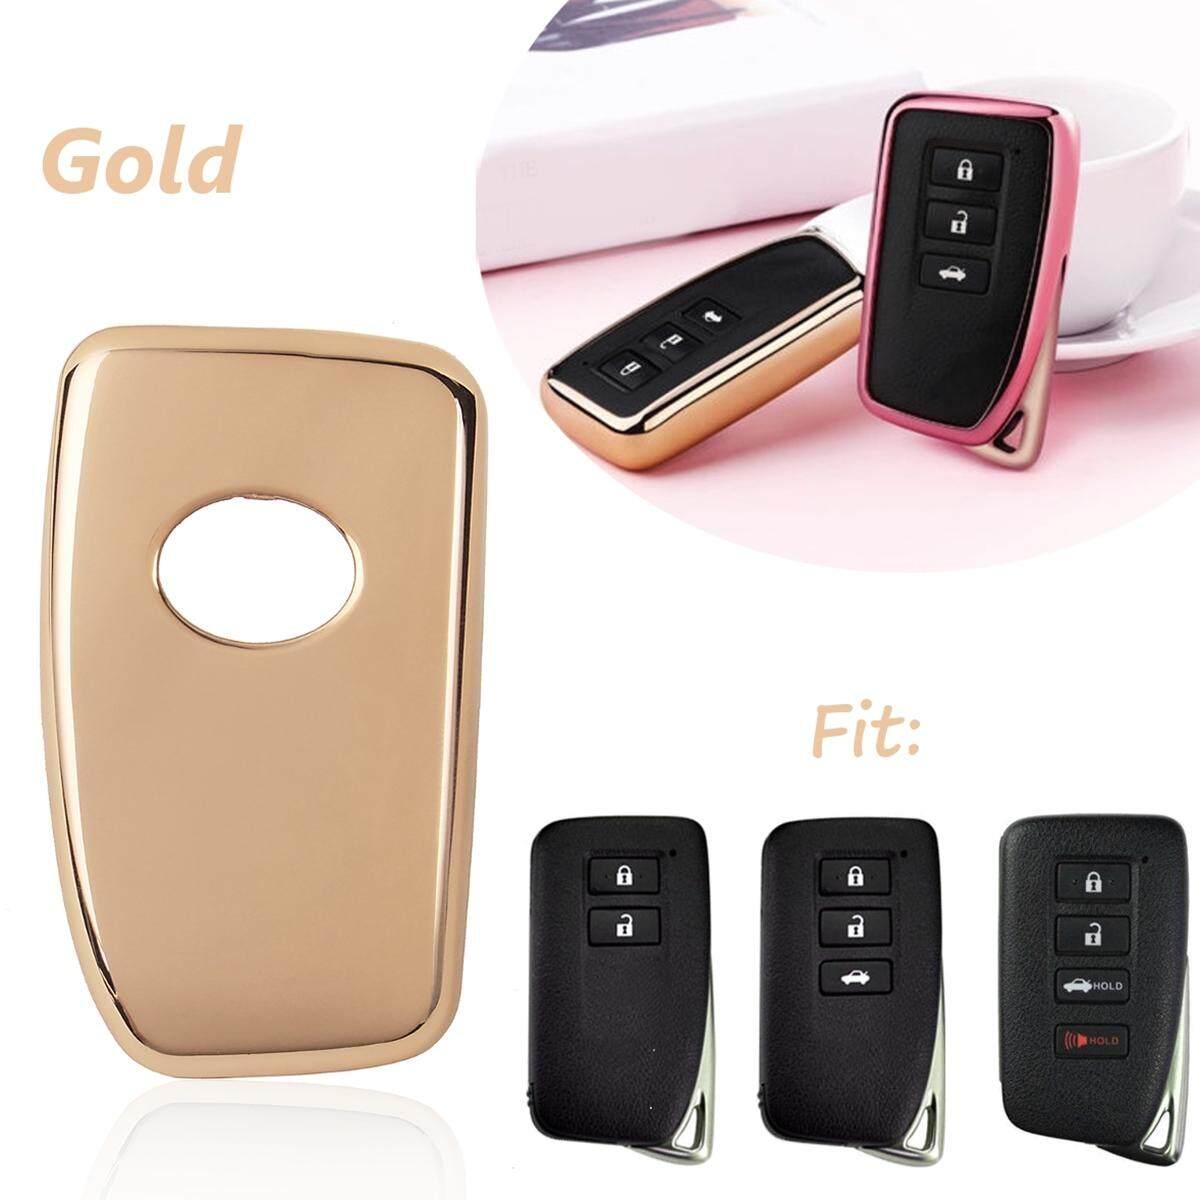 TPU Remote Kotak Kunci Alarm Shell Penutup untuk Lexus Adalah Ialah GS LS RC NX RX 200 300 350-Intl